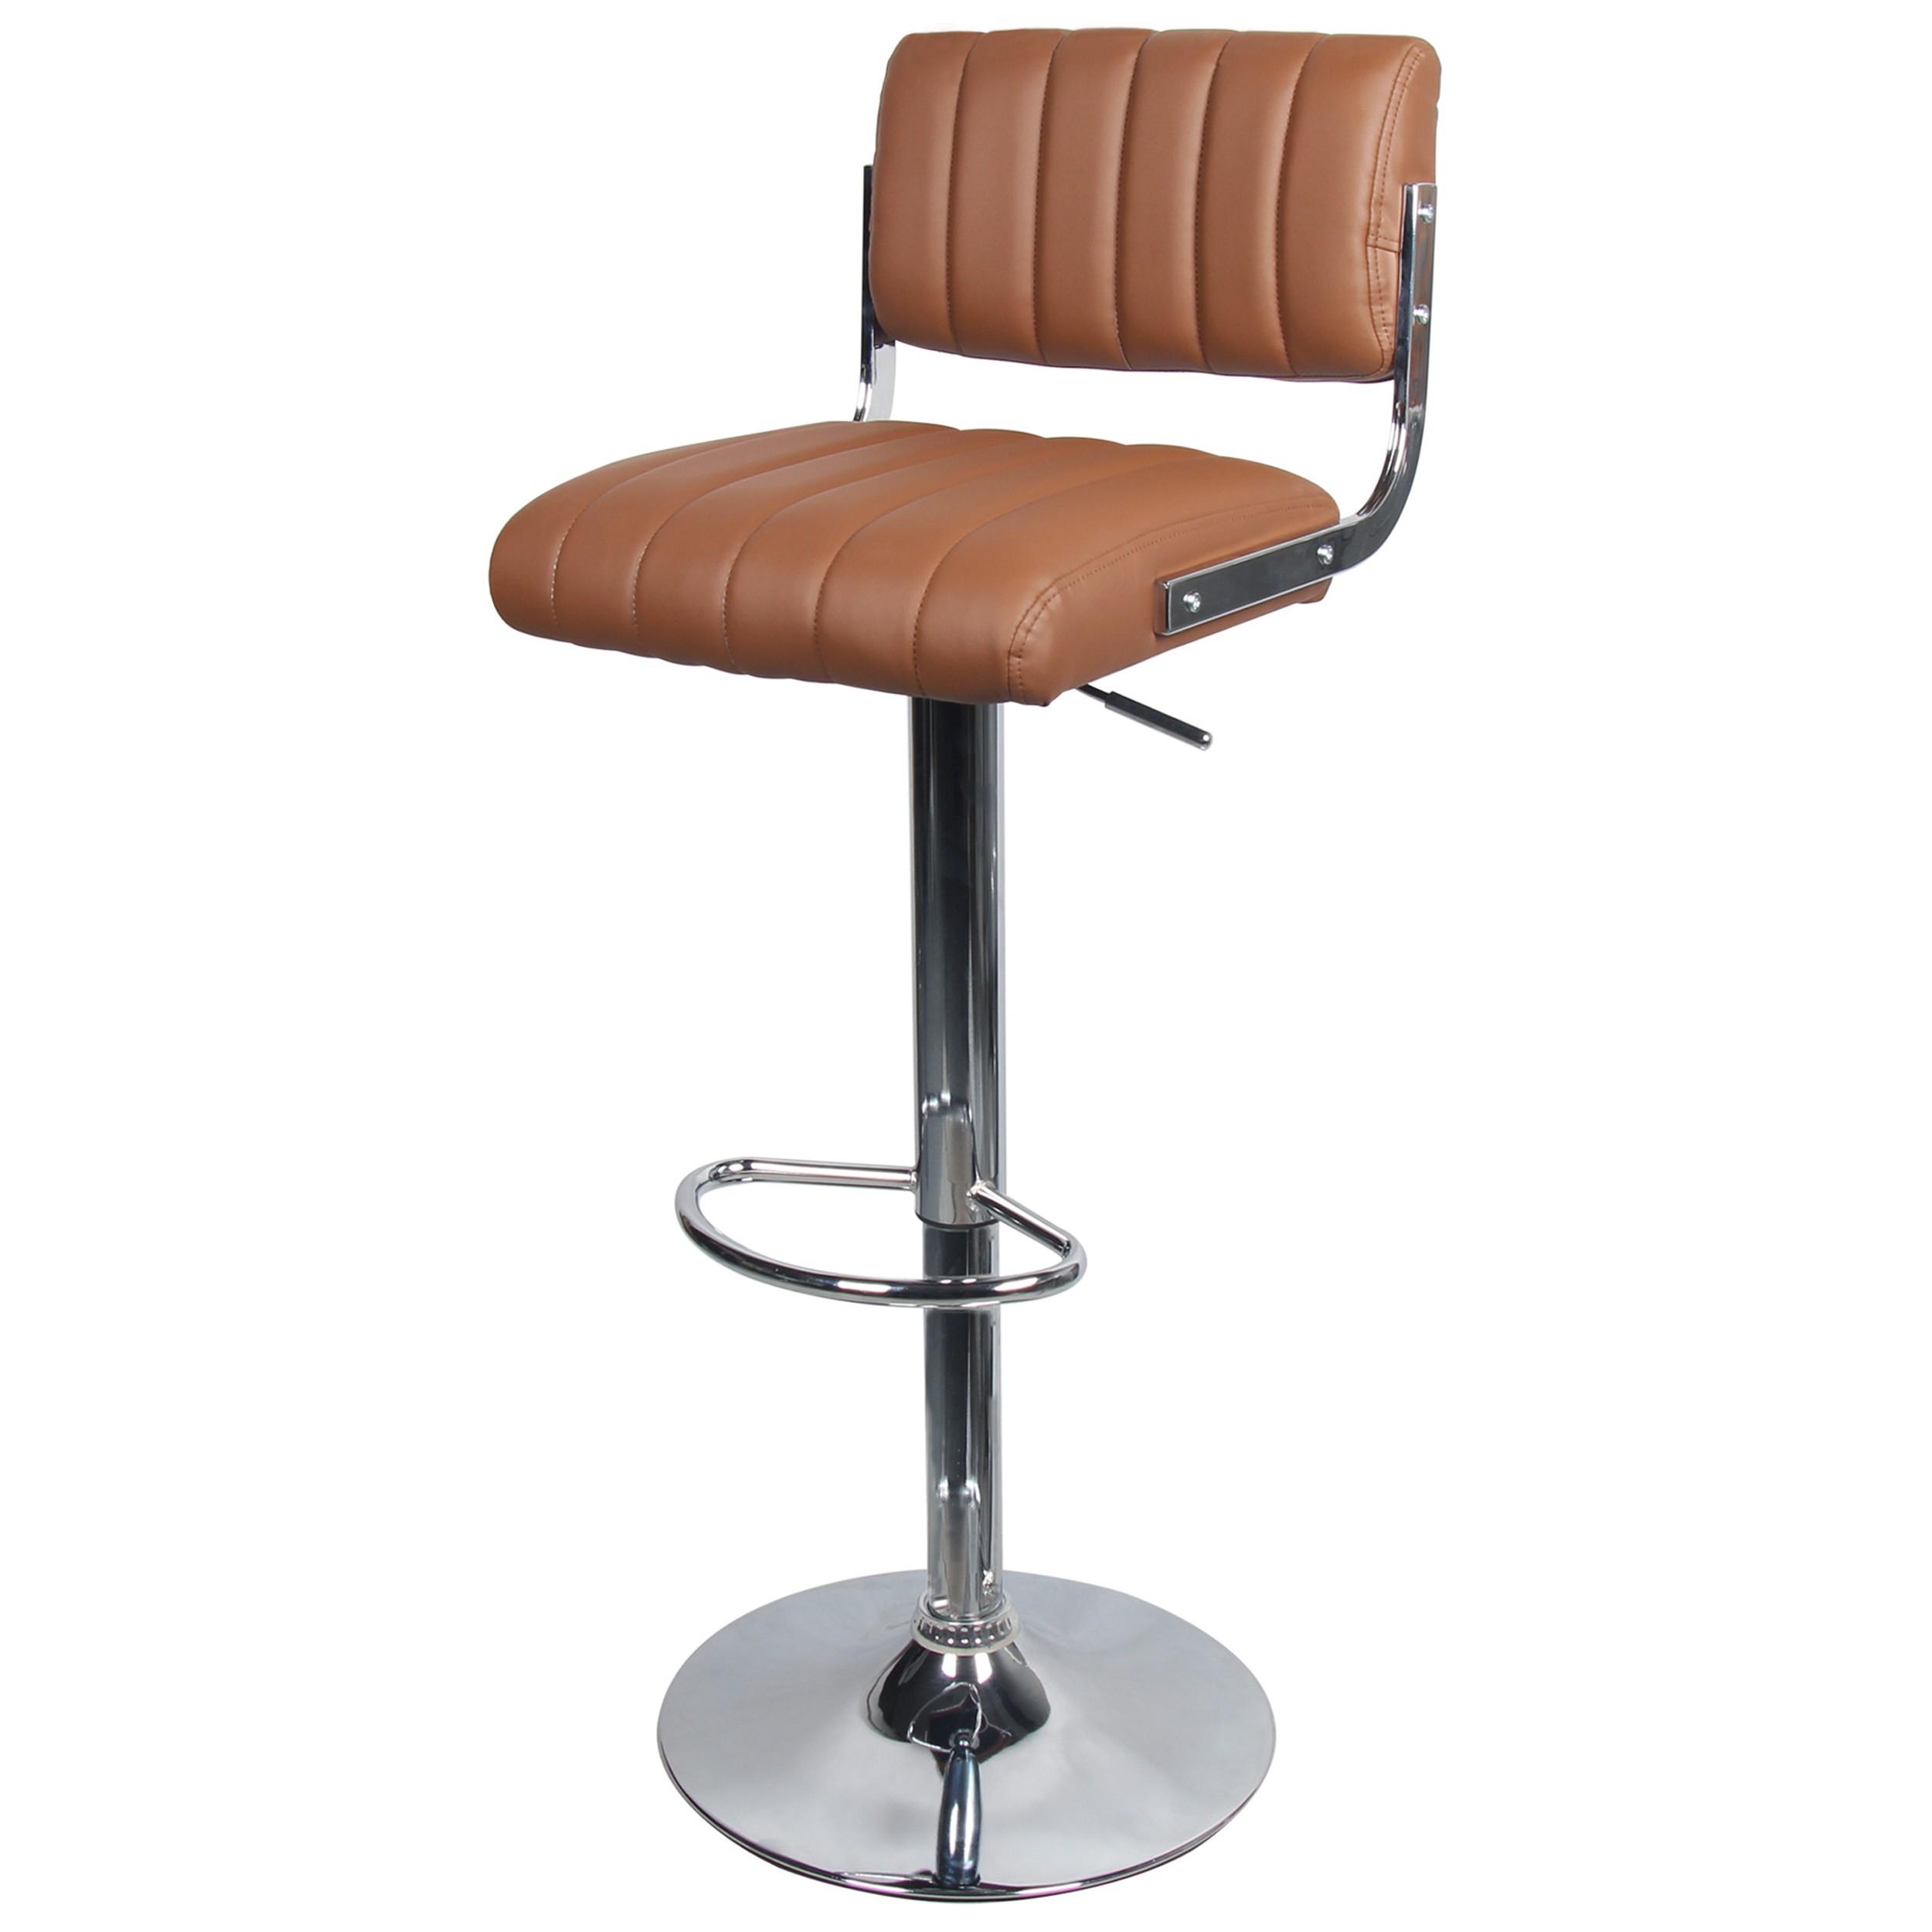 chaise de bar cuir marron